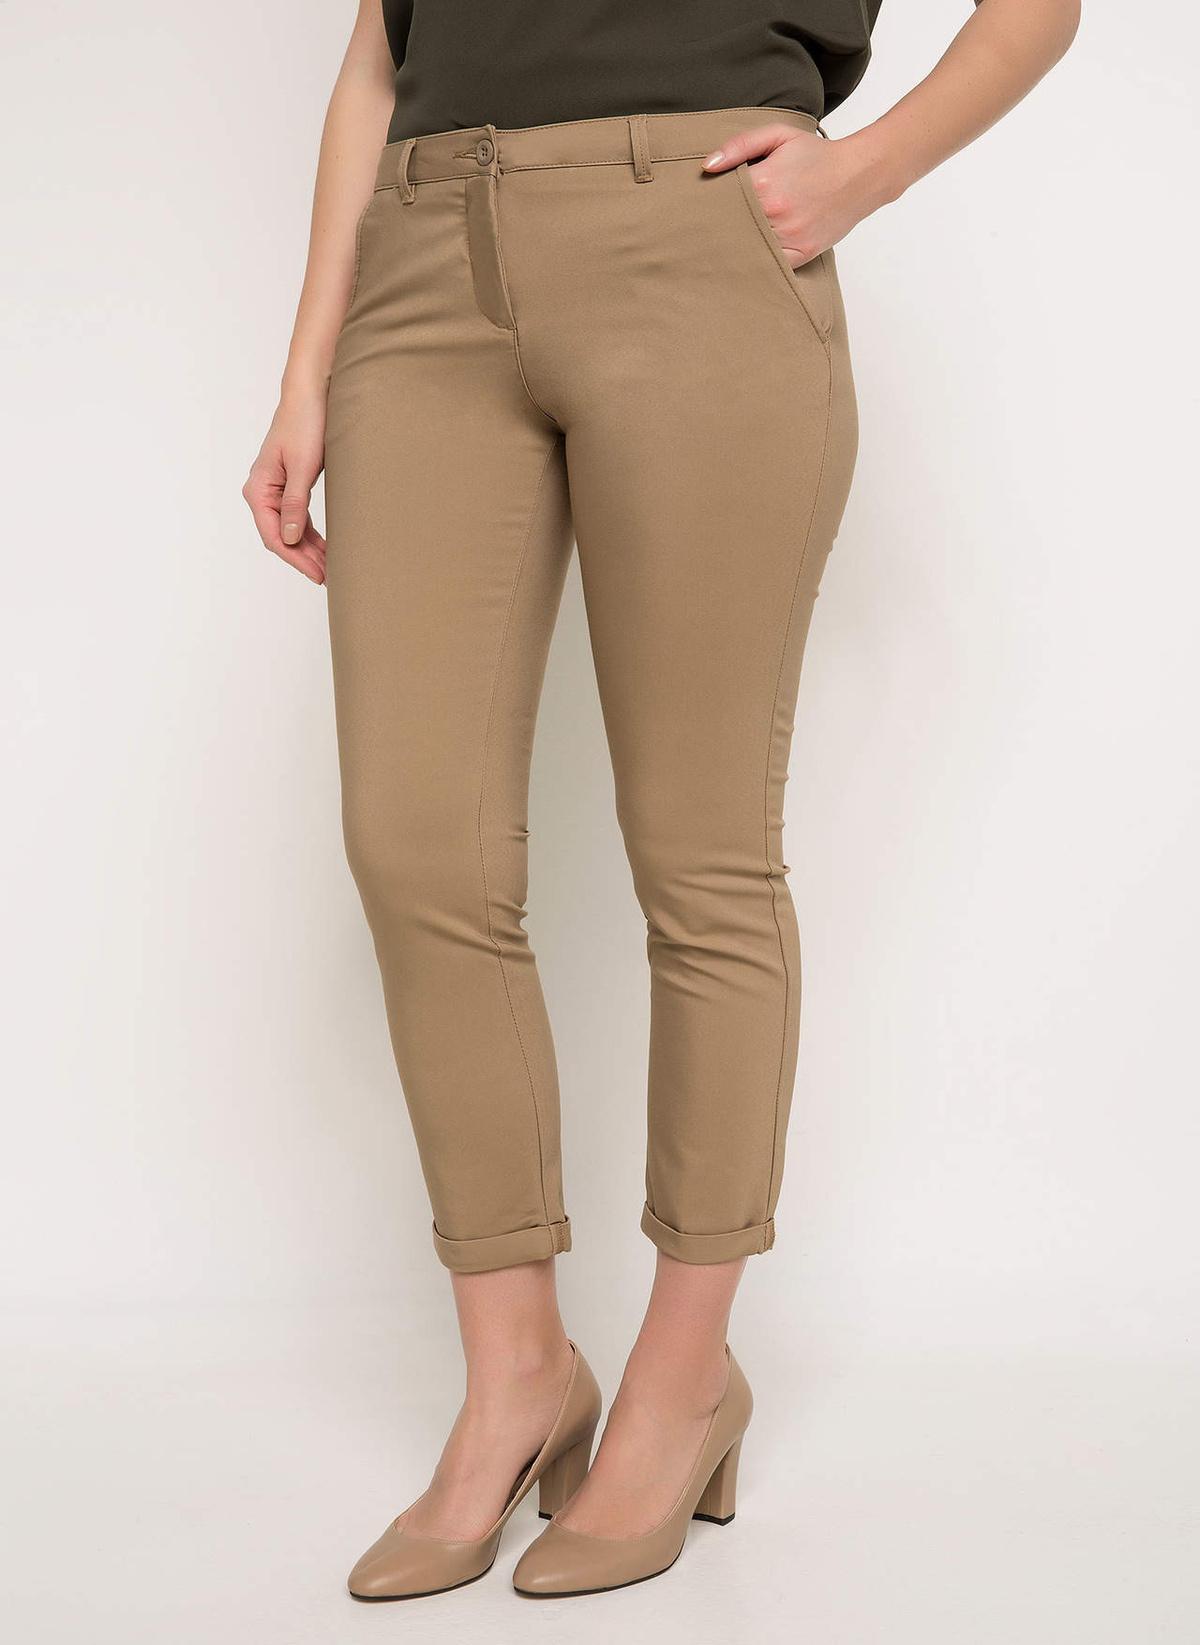 Defacto Slim Fit Denim Chino Pantolon I0617az18spbg82pantolon – 49.99 TL